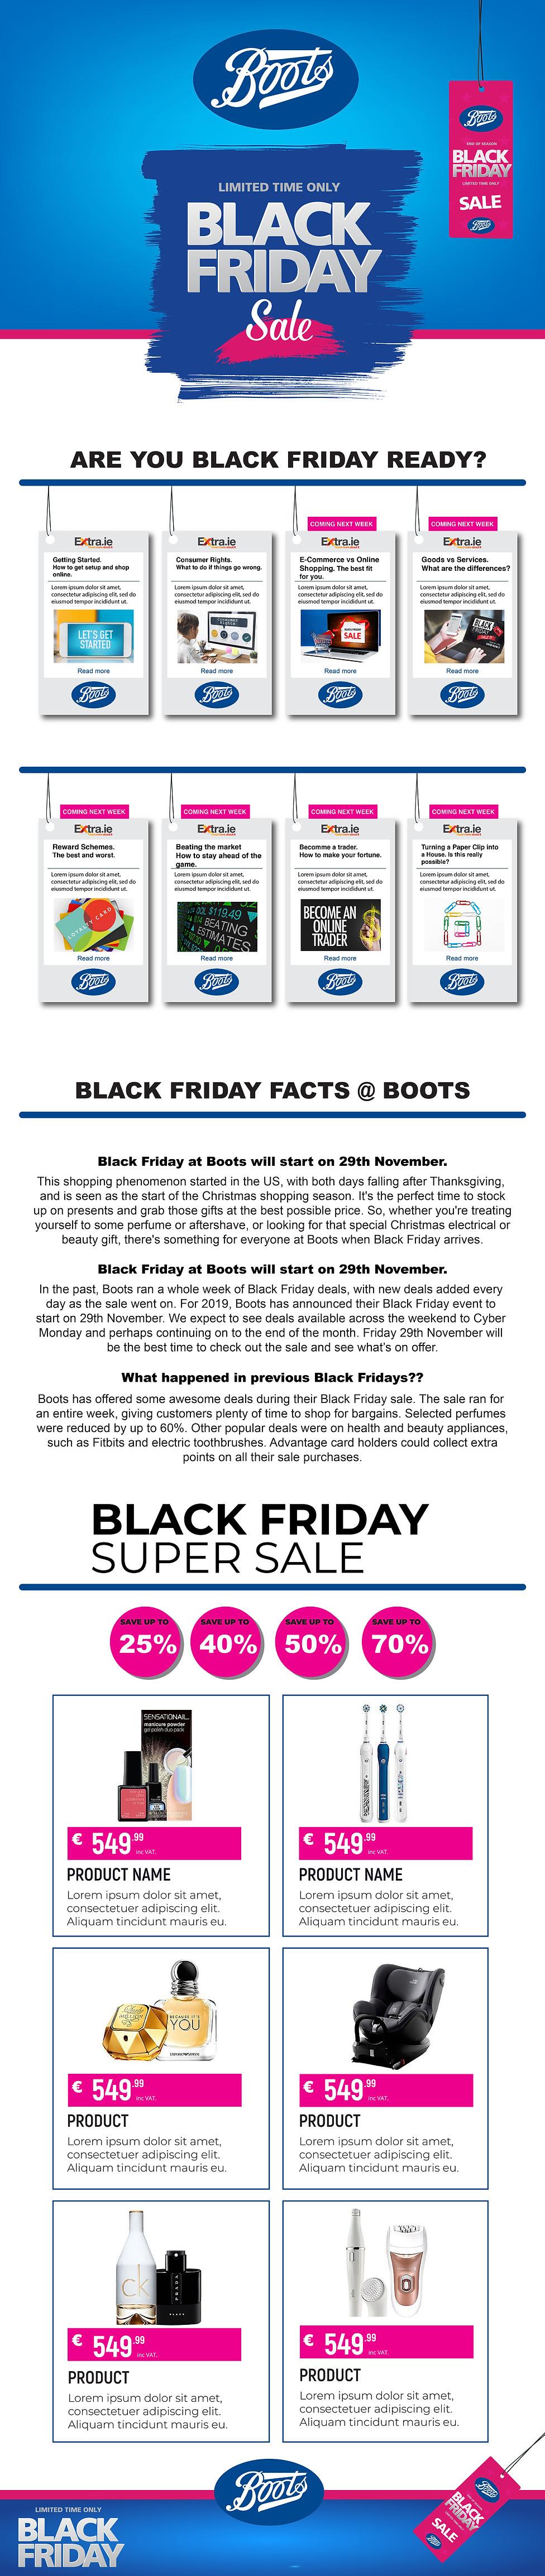 BLACK_FRIDAY_BOOTS_HUB-01.jpg